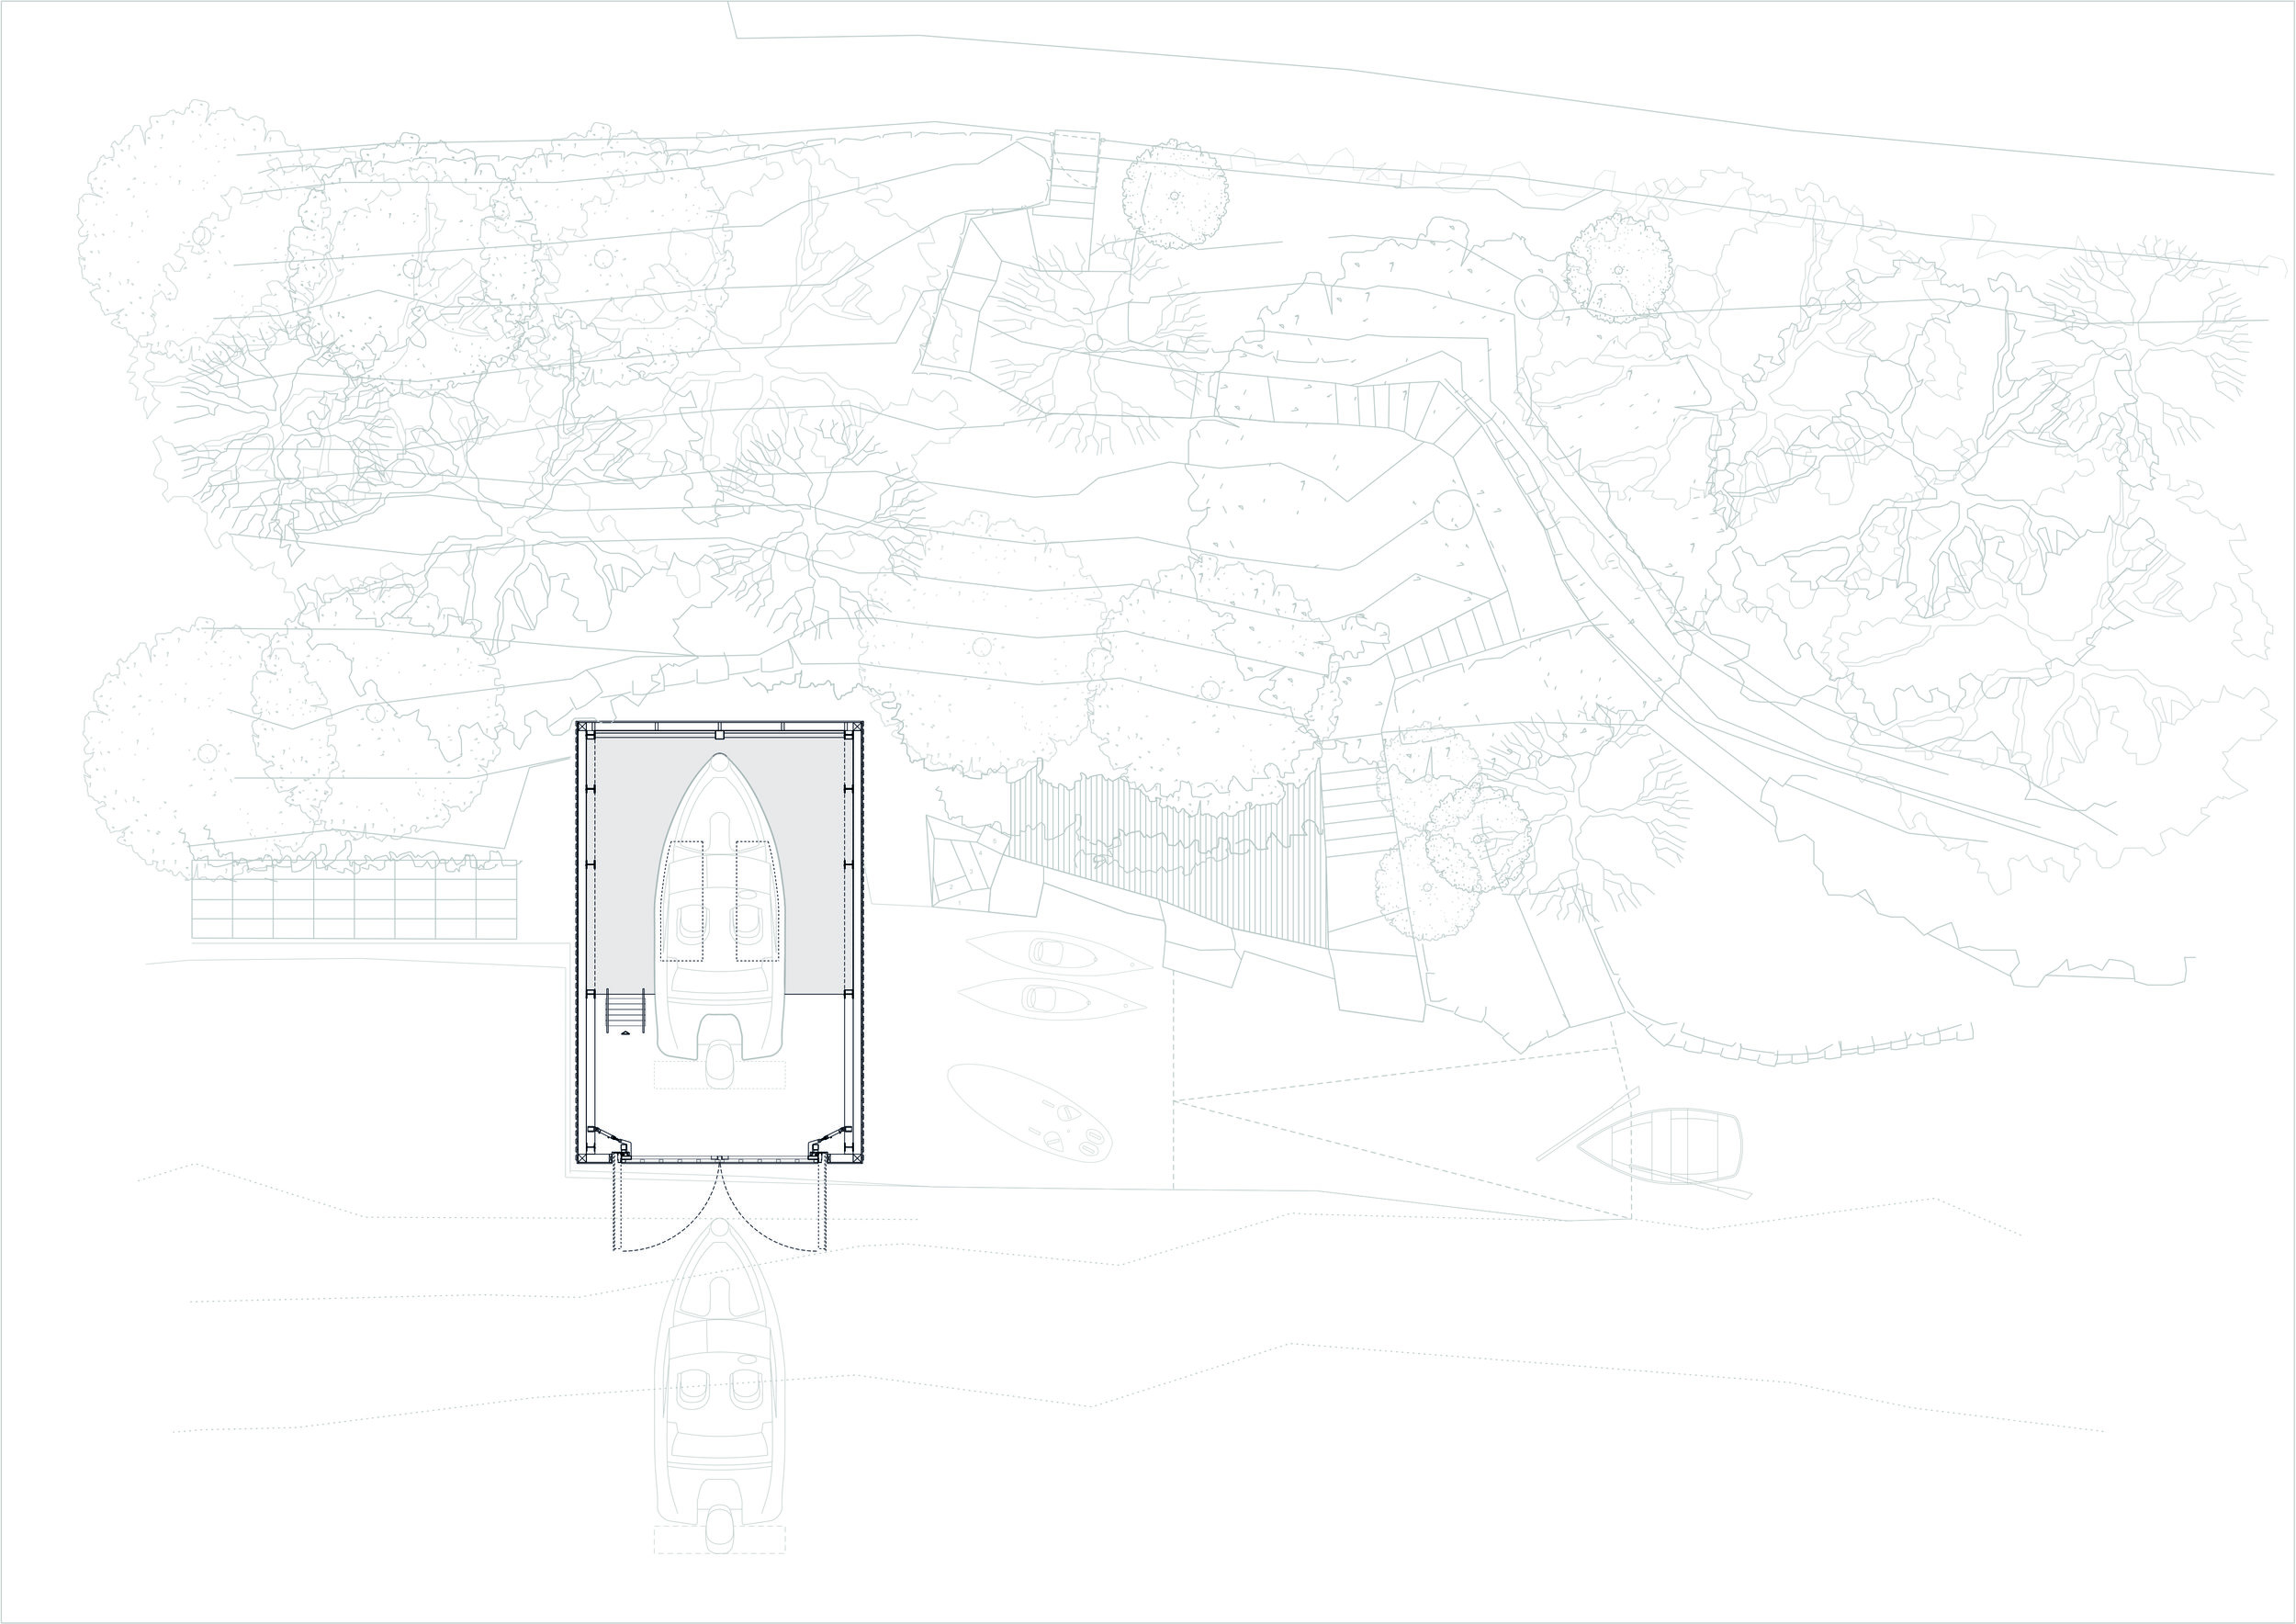 Boathouse-First Floor Plan-100A3.jpg